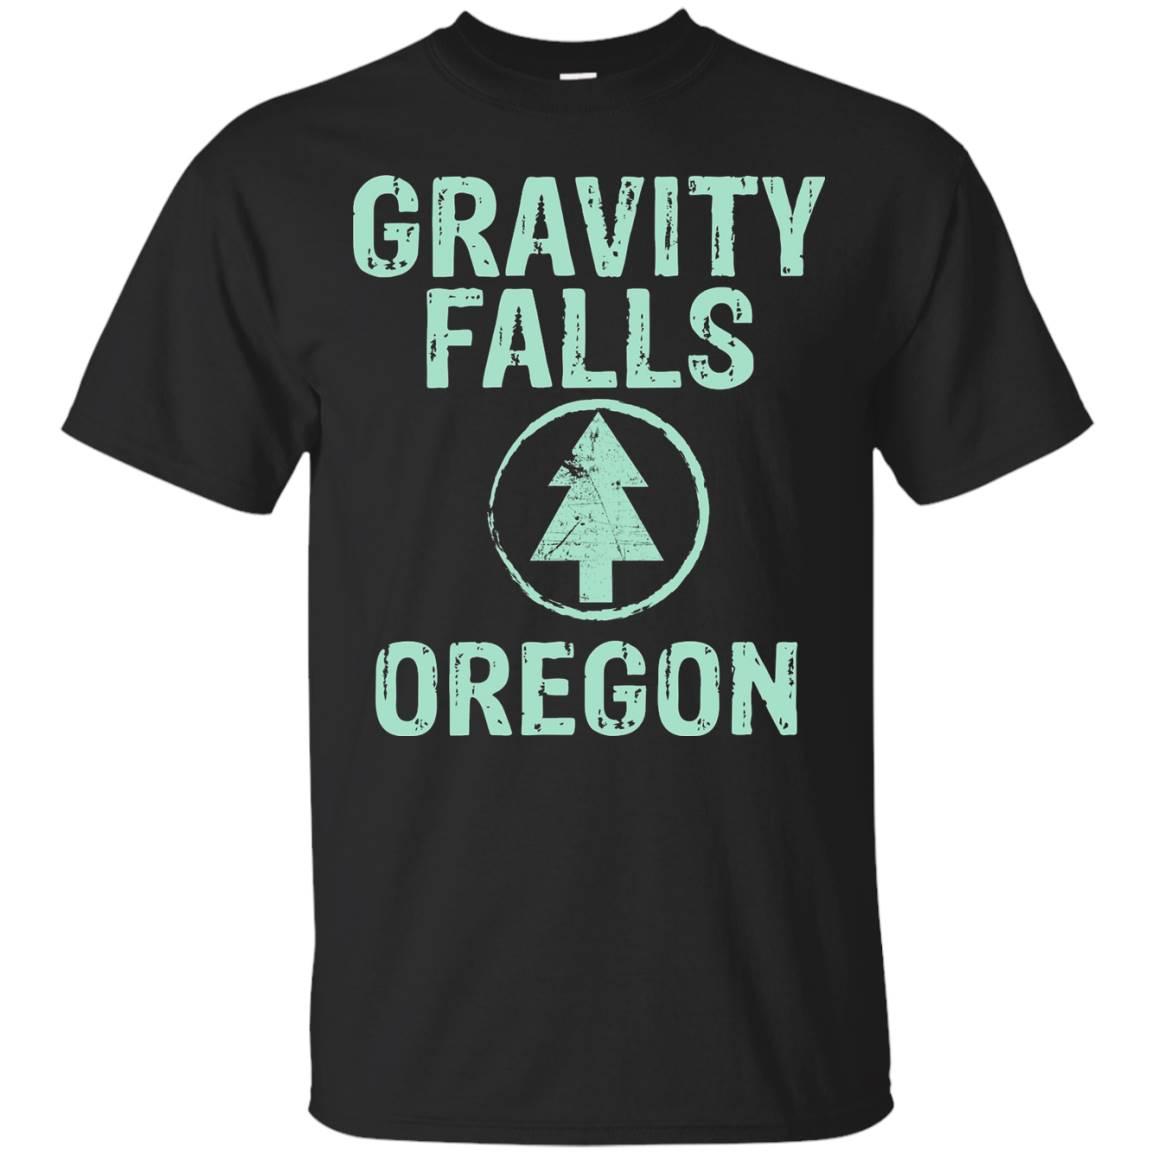 Gravity Falls T-Shirt – Oregon Pine Shirt